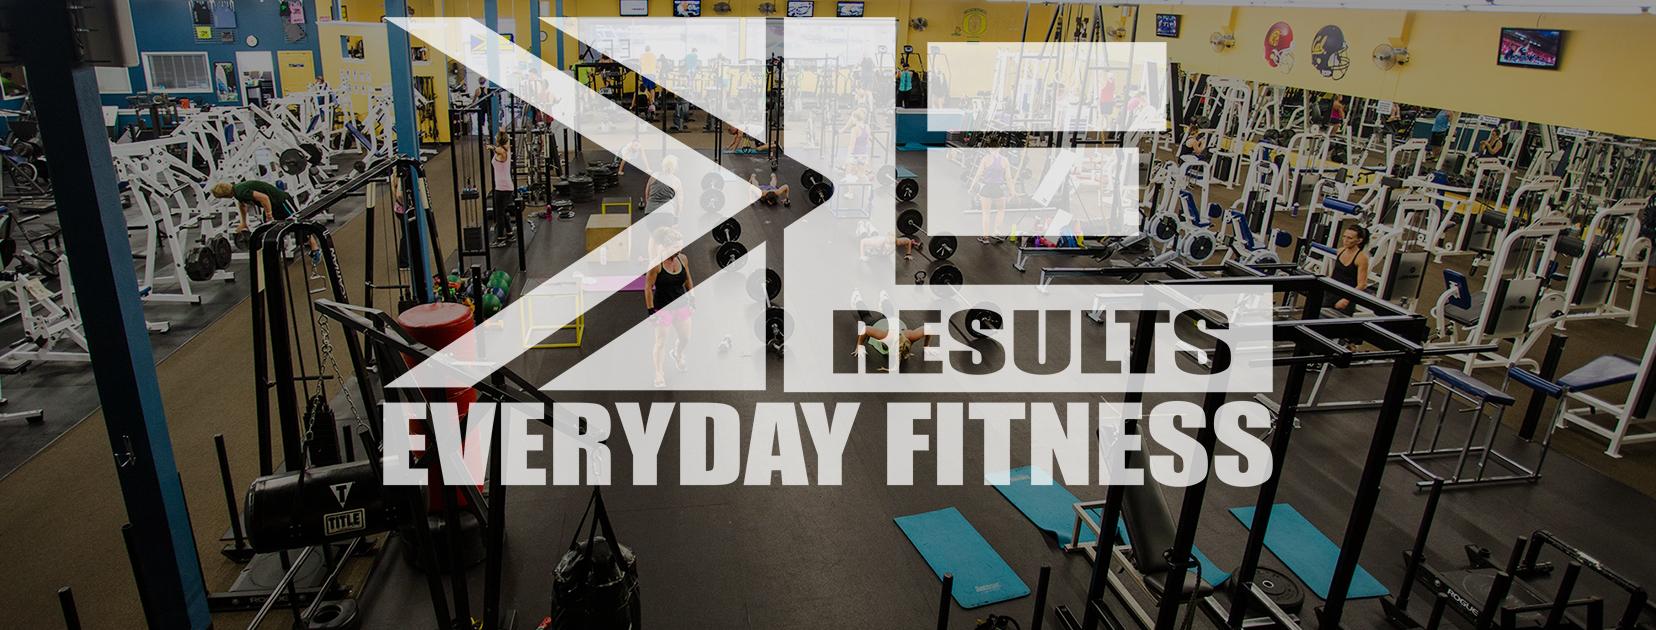 EveryDay Fitness Redding CA, Sponsor of 2018 Redding Health Expo